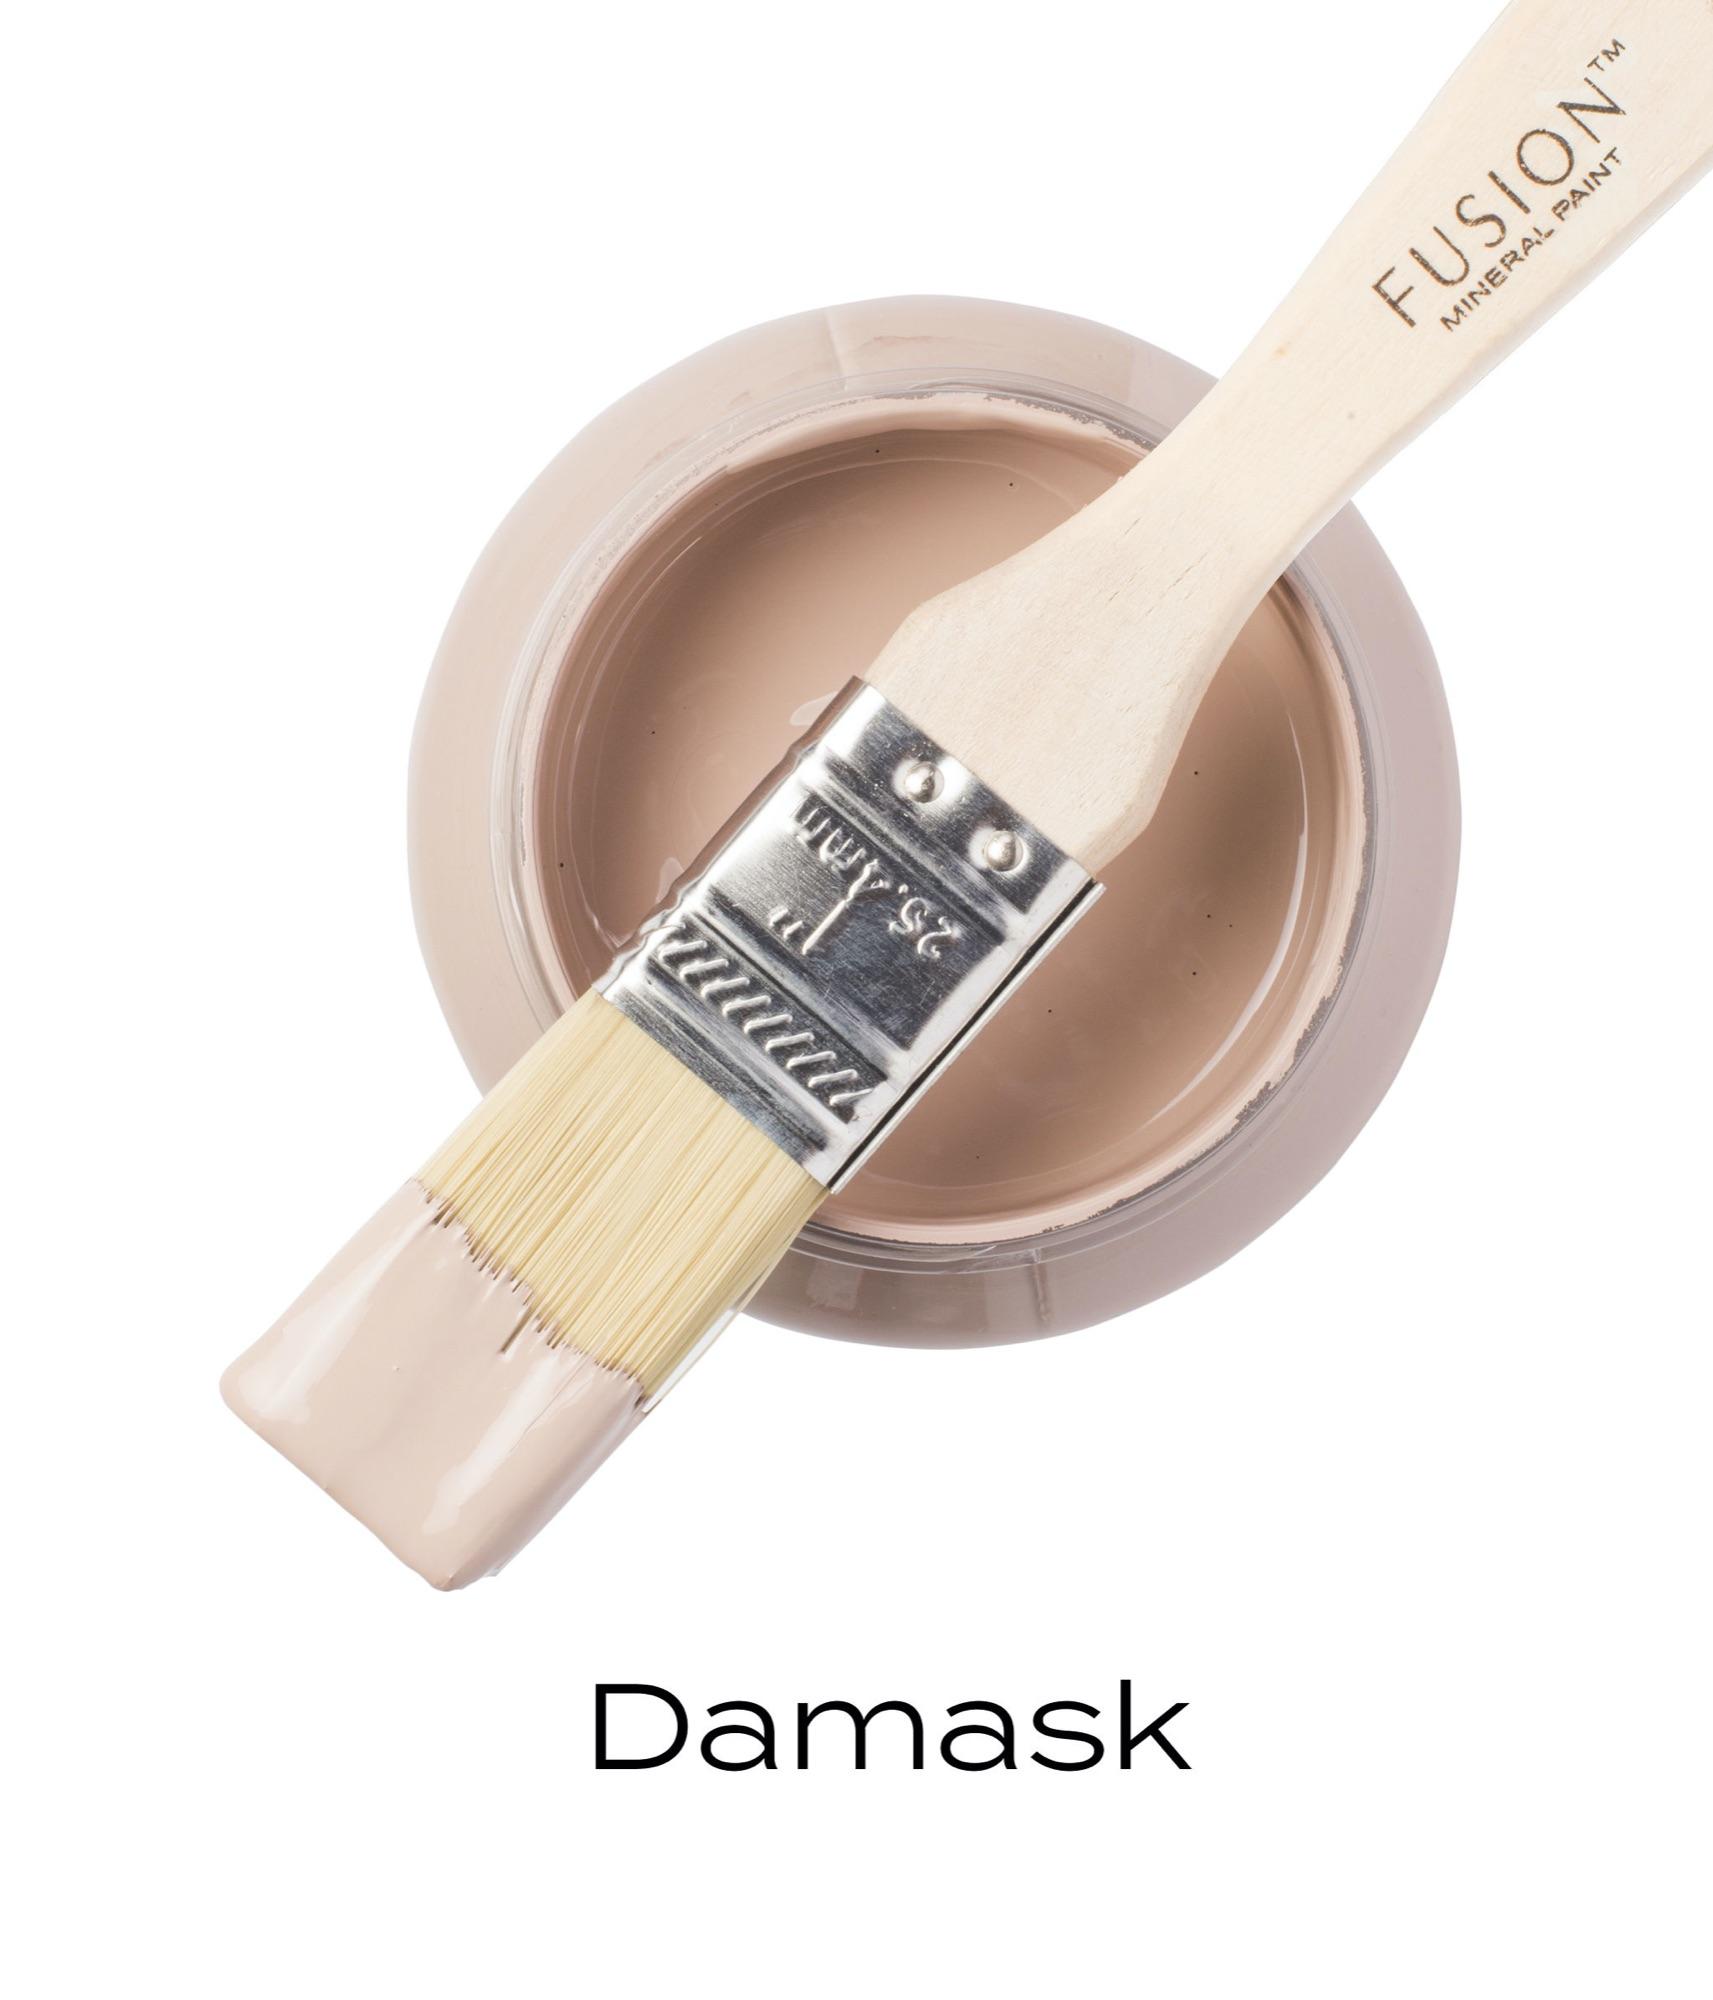 T1DAMASK